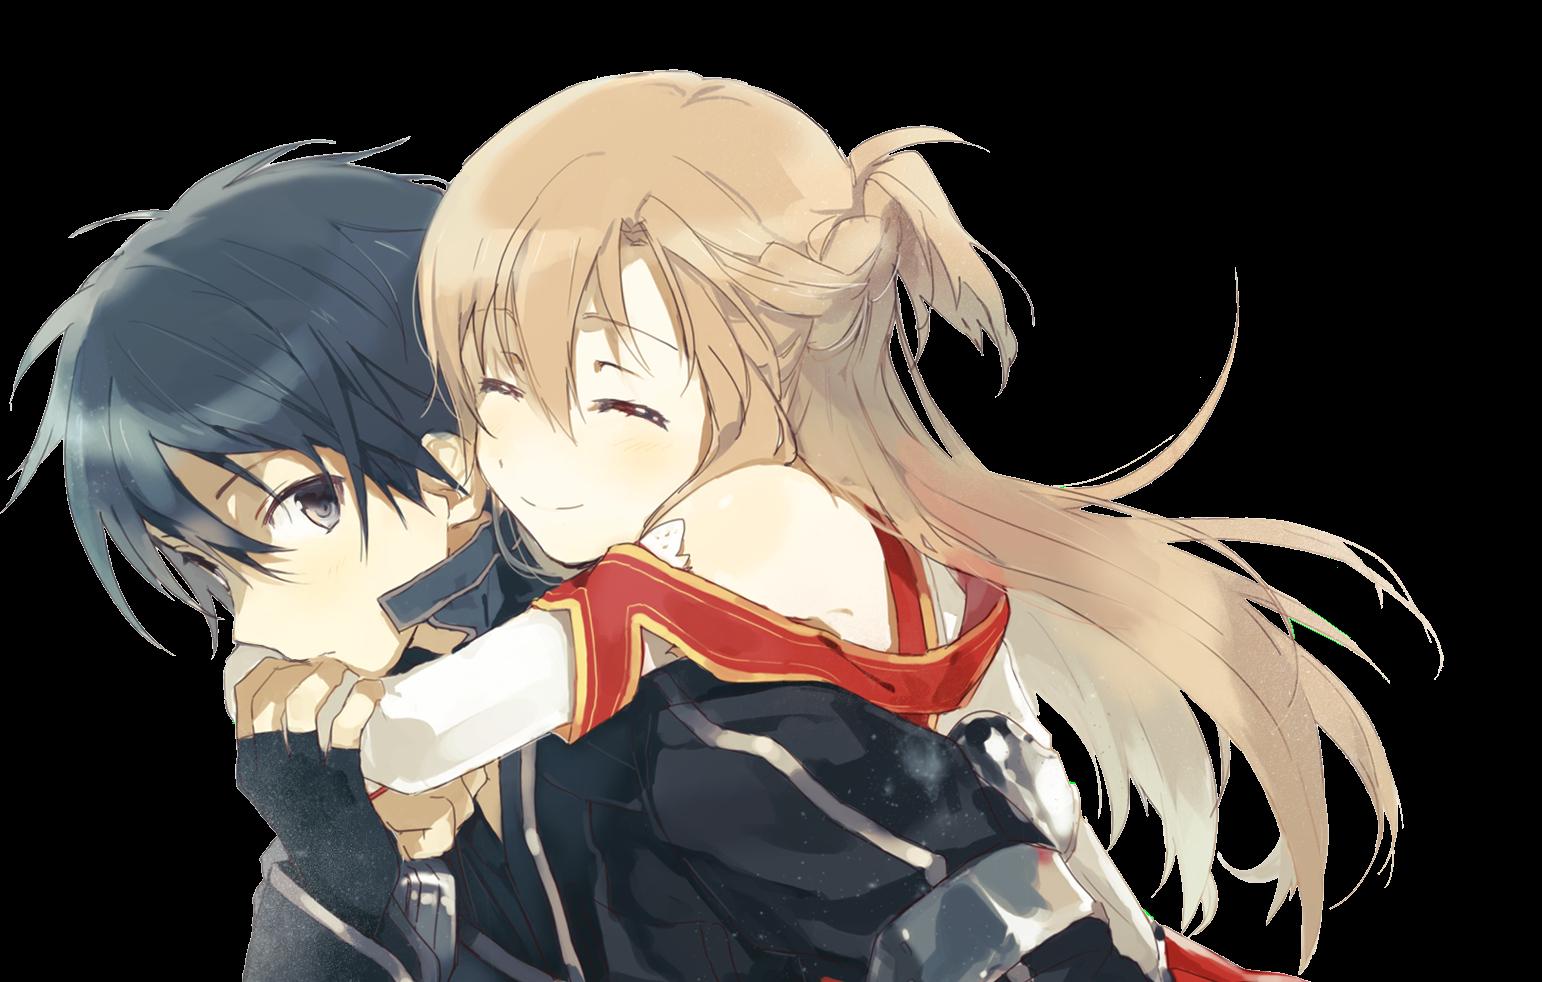 Sword Art Online - Kirito and AsunaKirito And Asuna